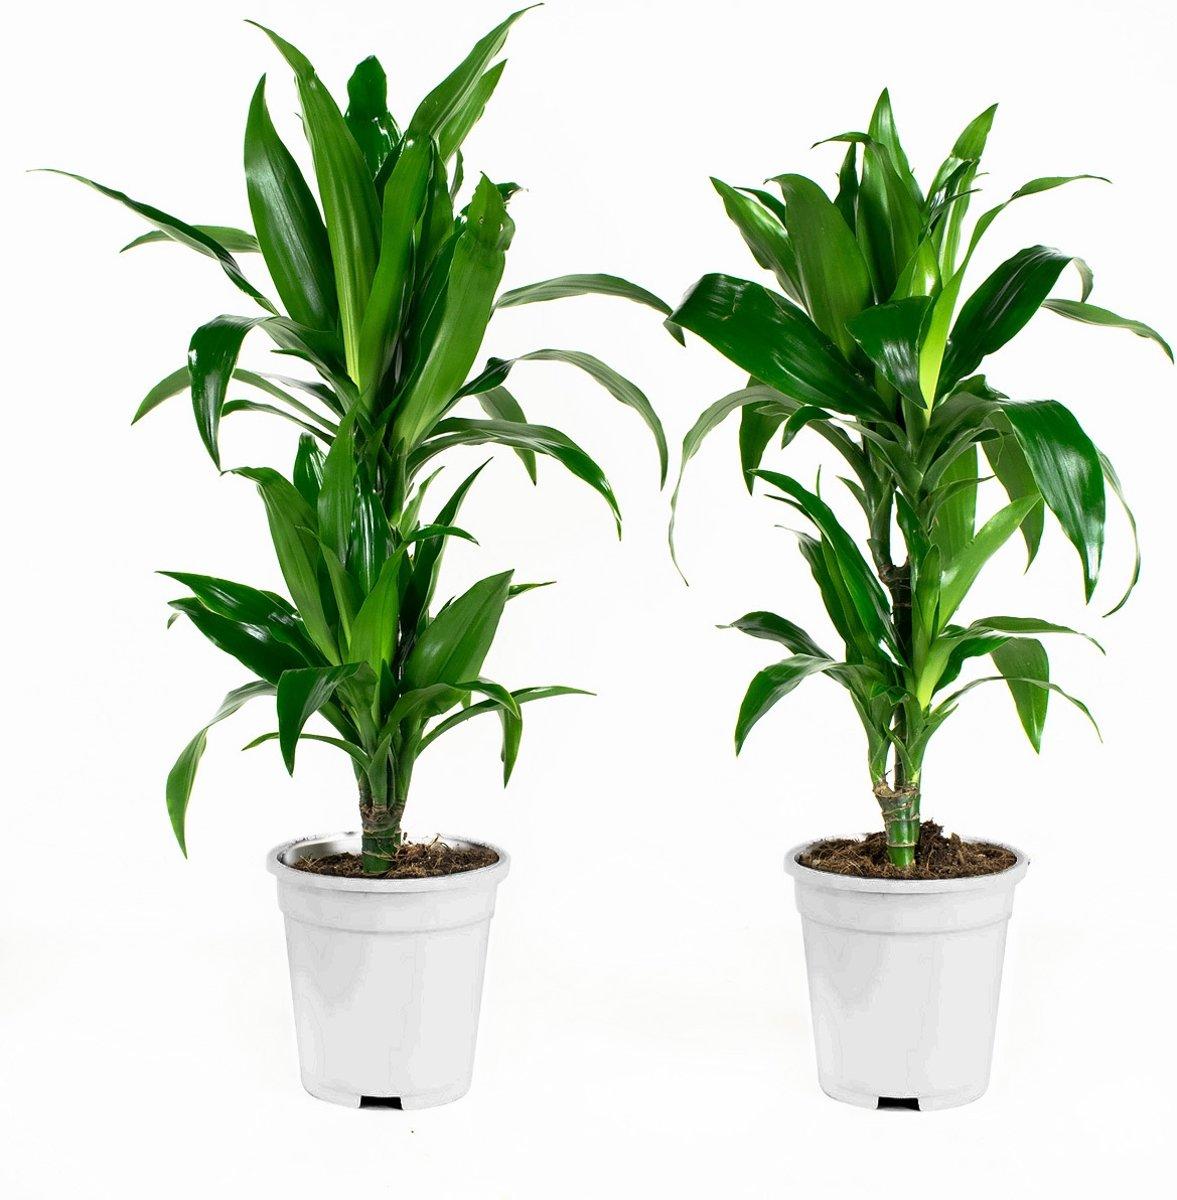 perfect stuks dracaena fragans janet craig hoogte cm with lepelplant giftig. Black Bedroom Furniture Sets. Home Design Ideas